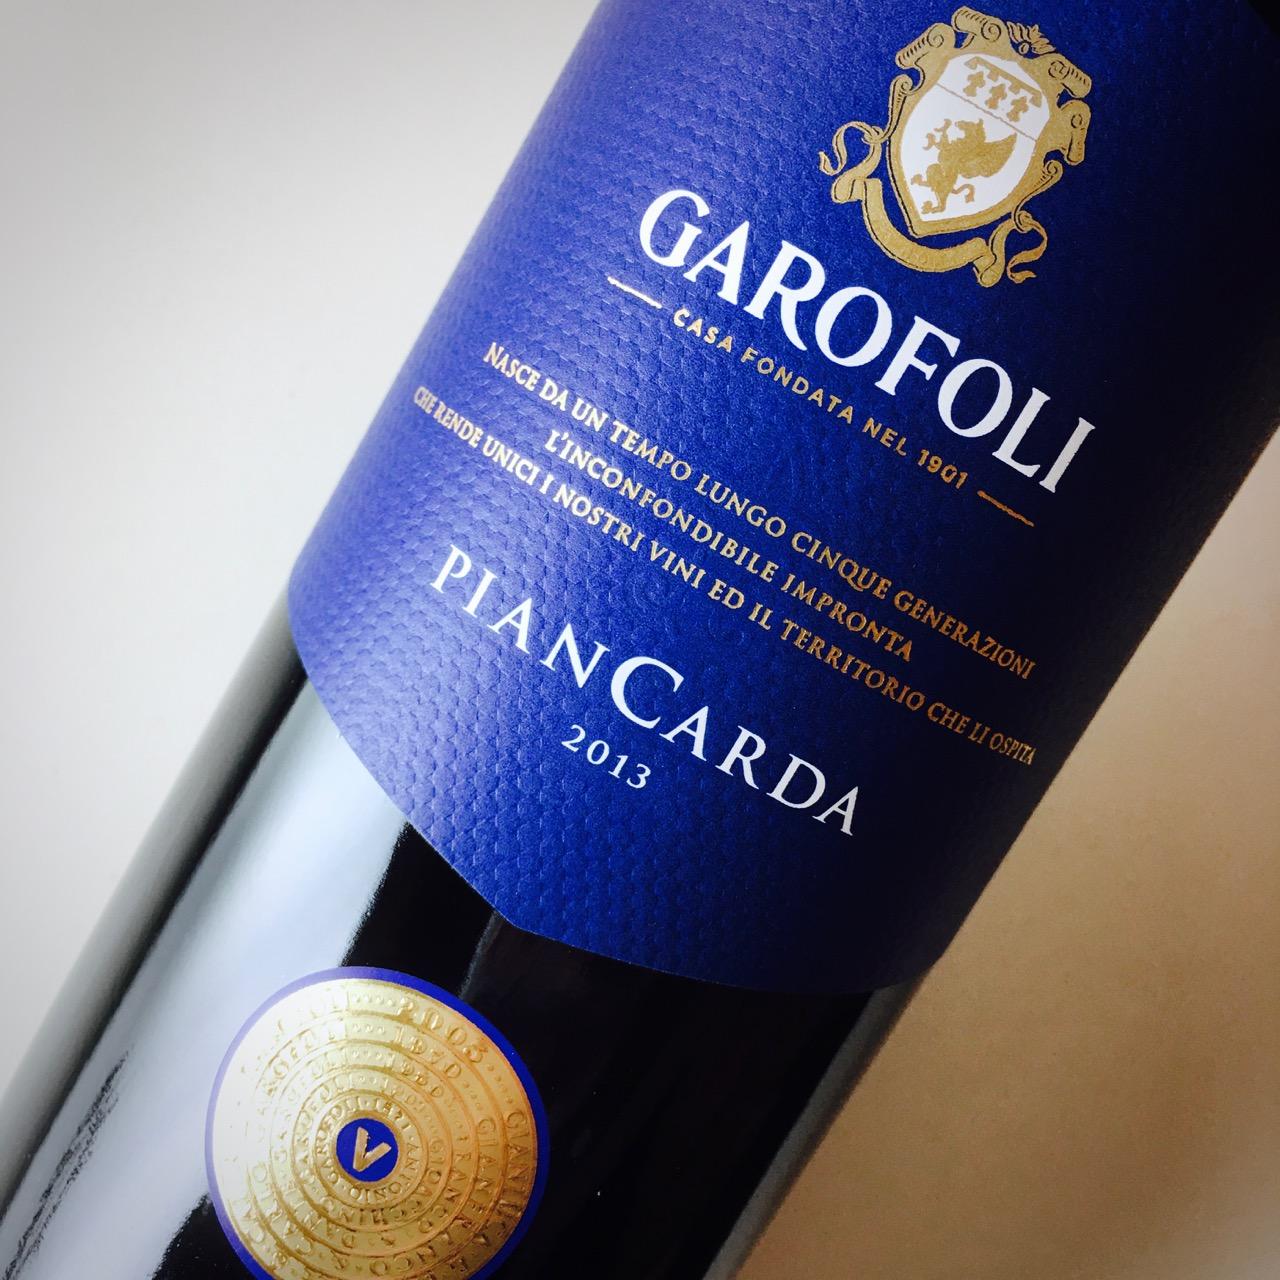 2013 Garofoli Piancarda Rosso Cònero DOC